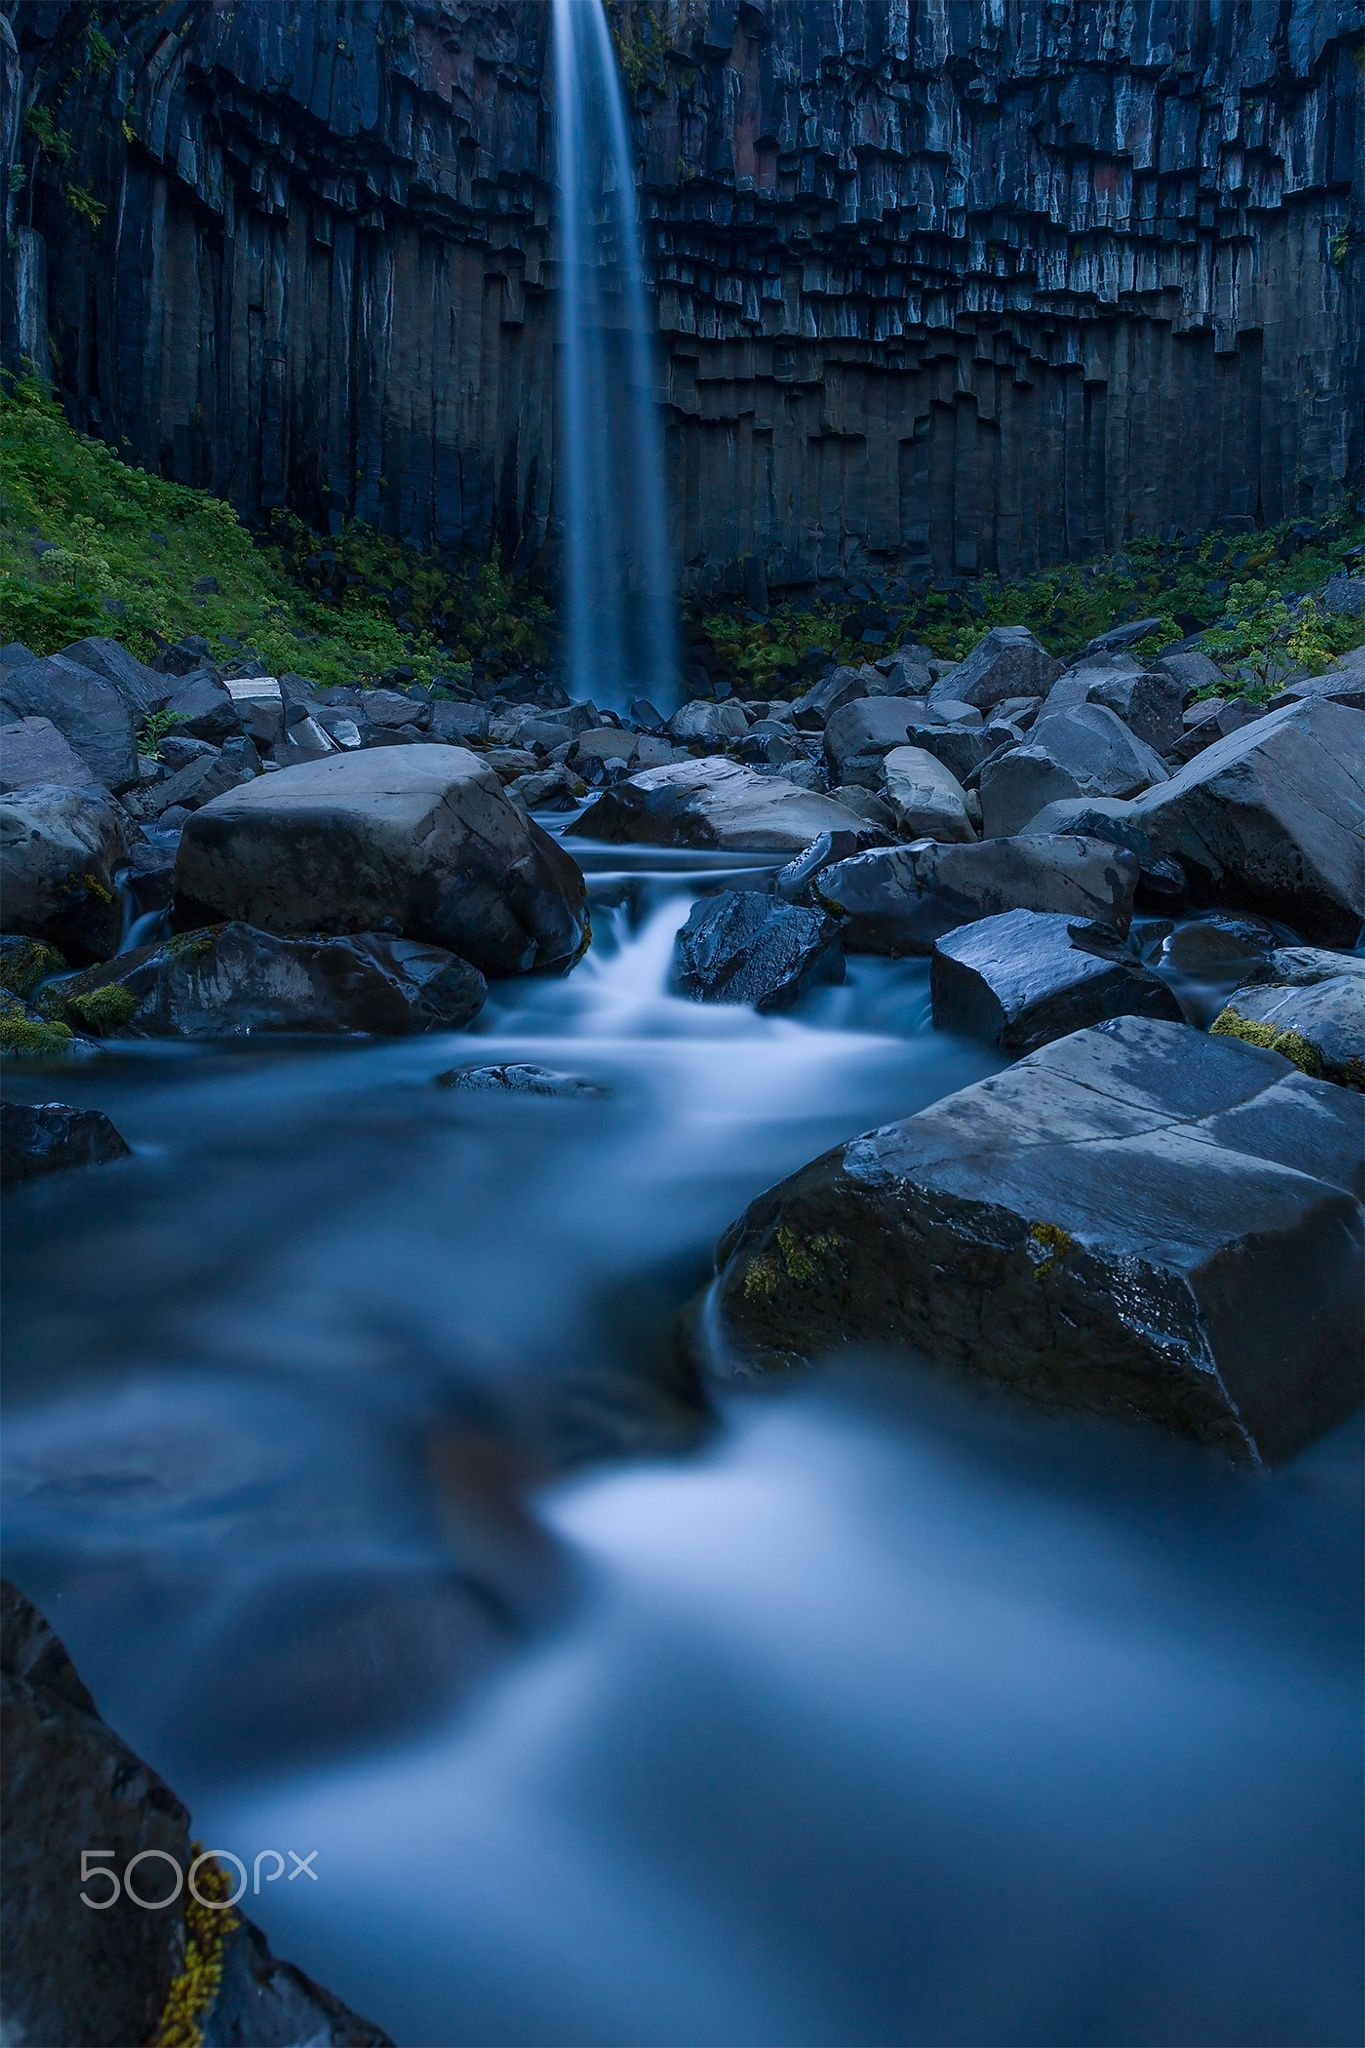 Blue Memory - Taken by Svartifoss South East Iceland.